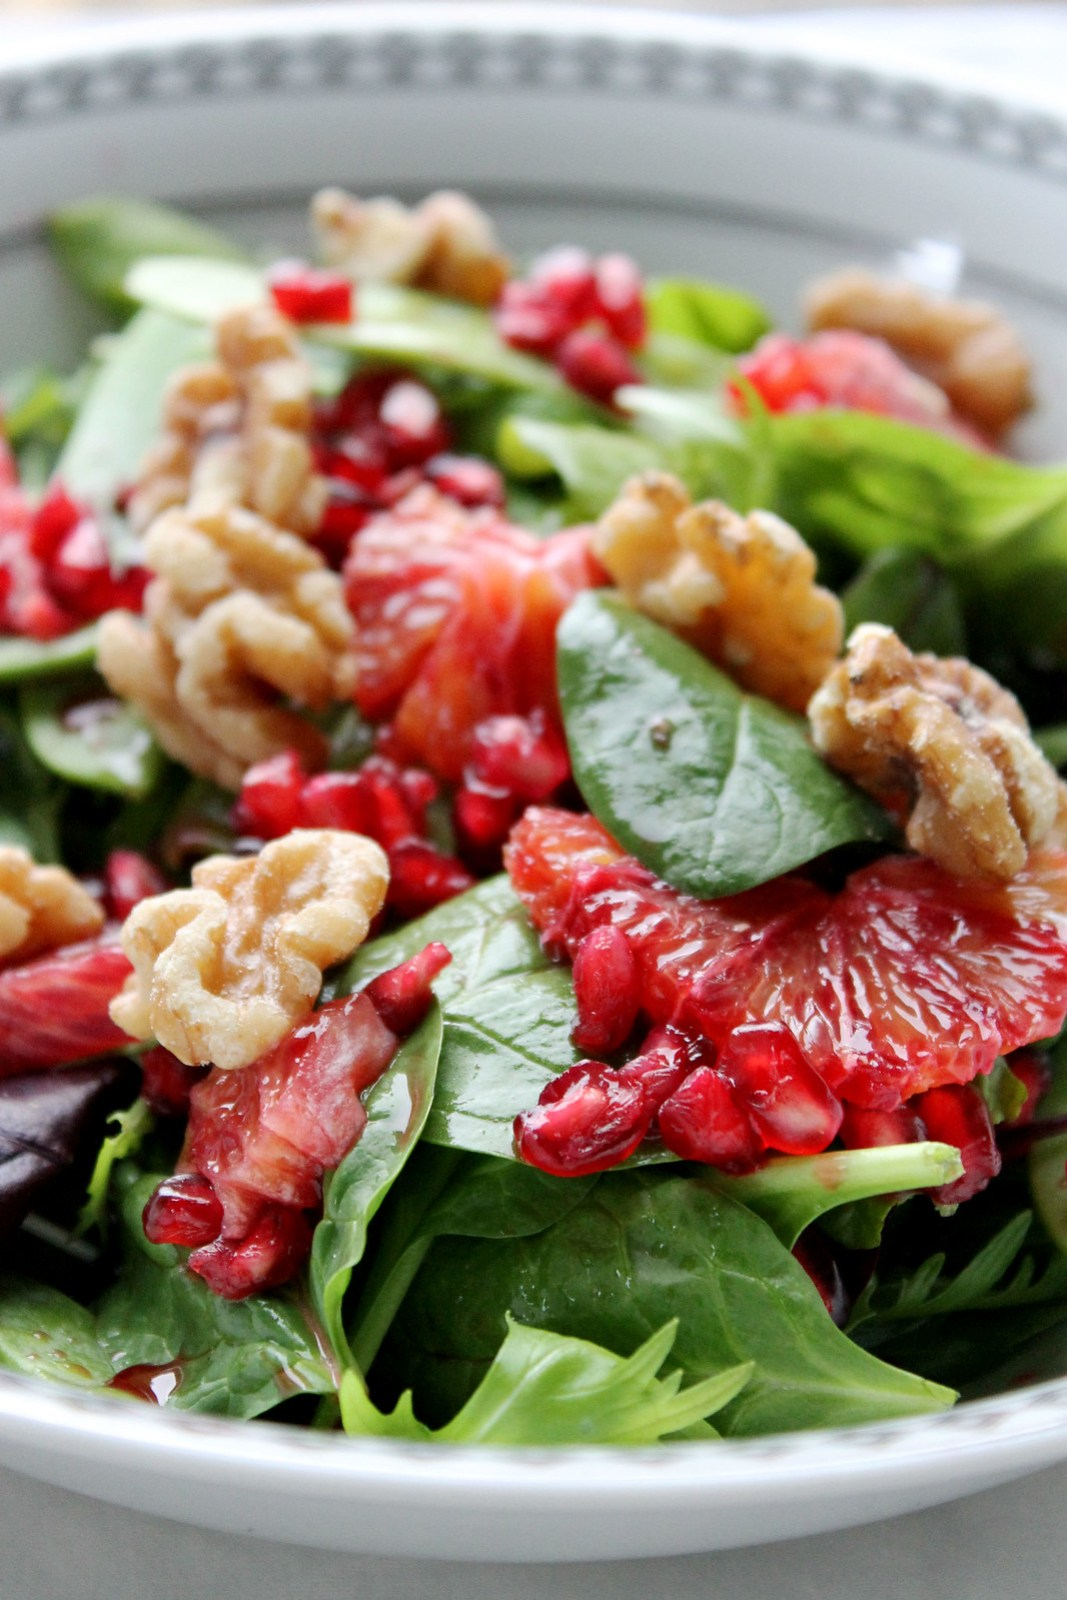 pomegranate blood orange salad